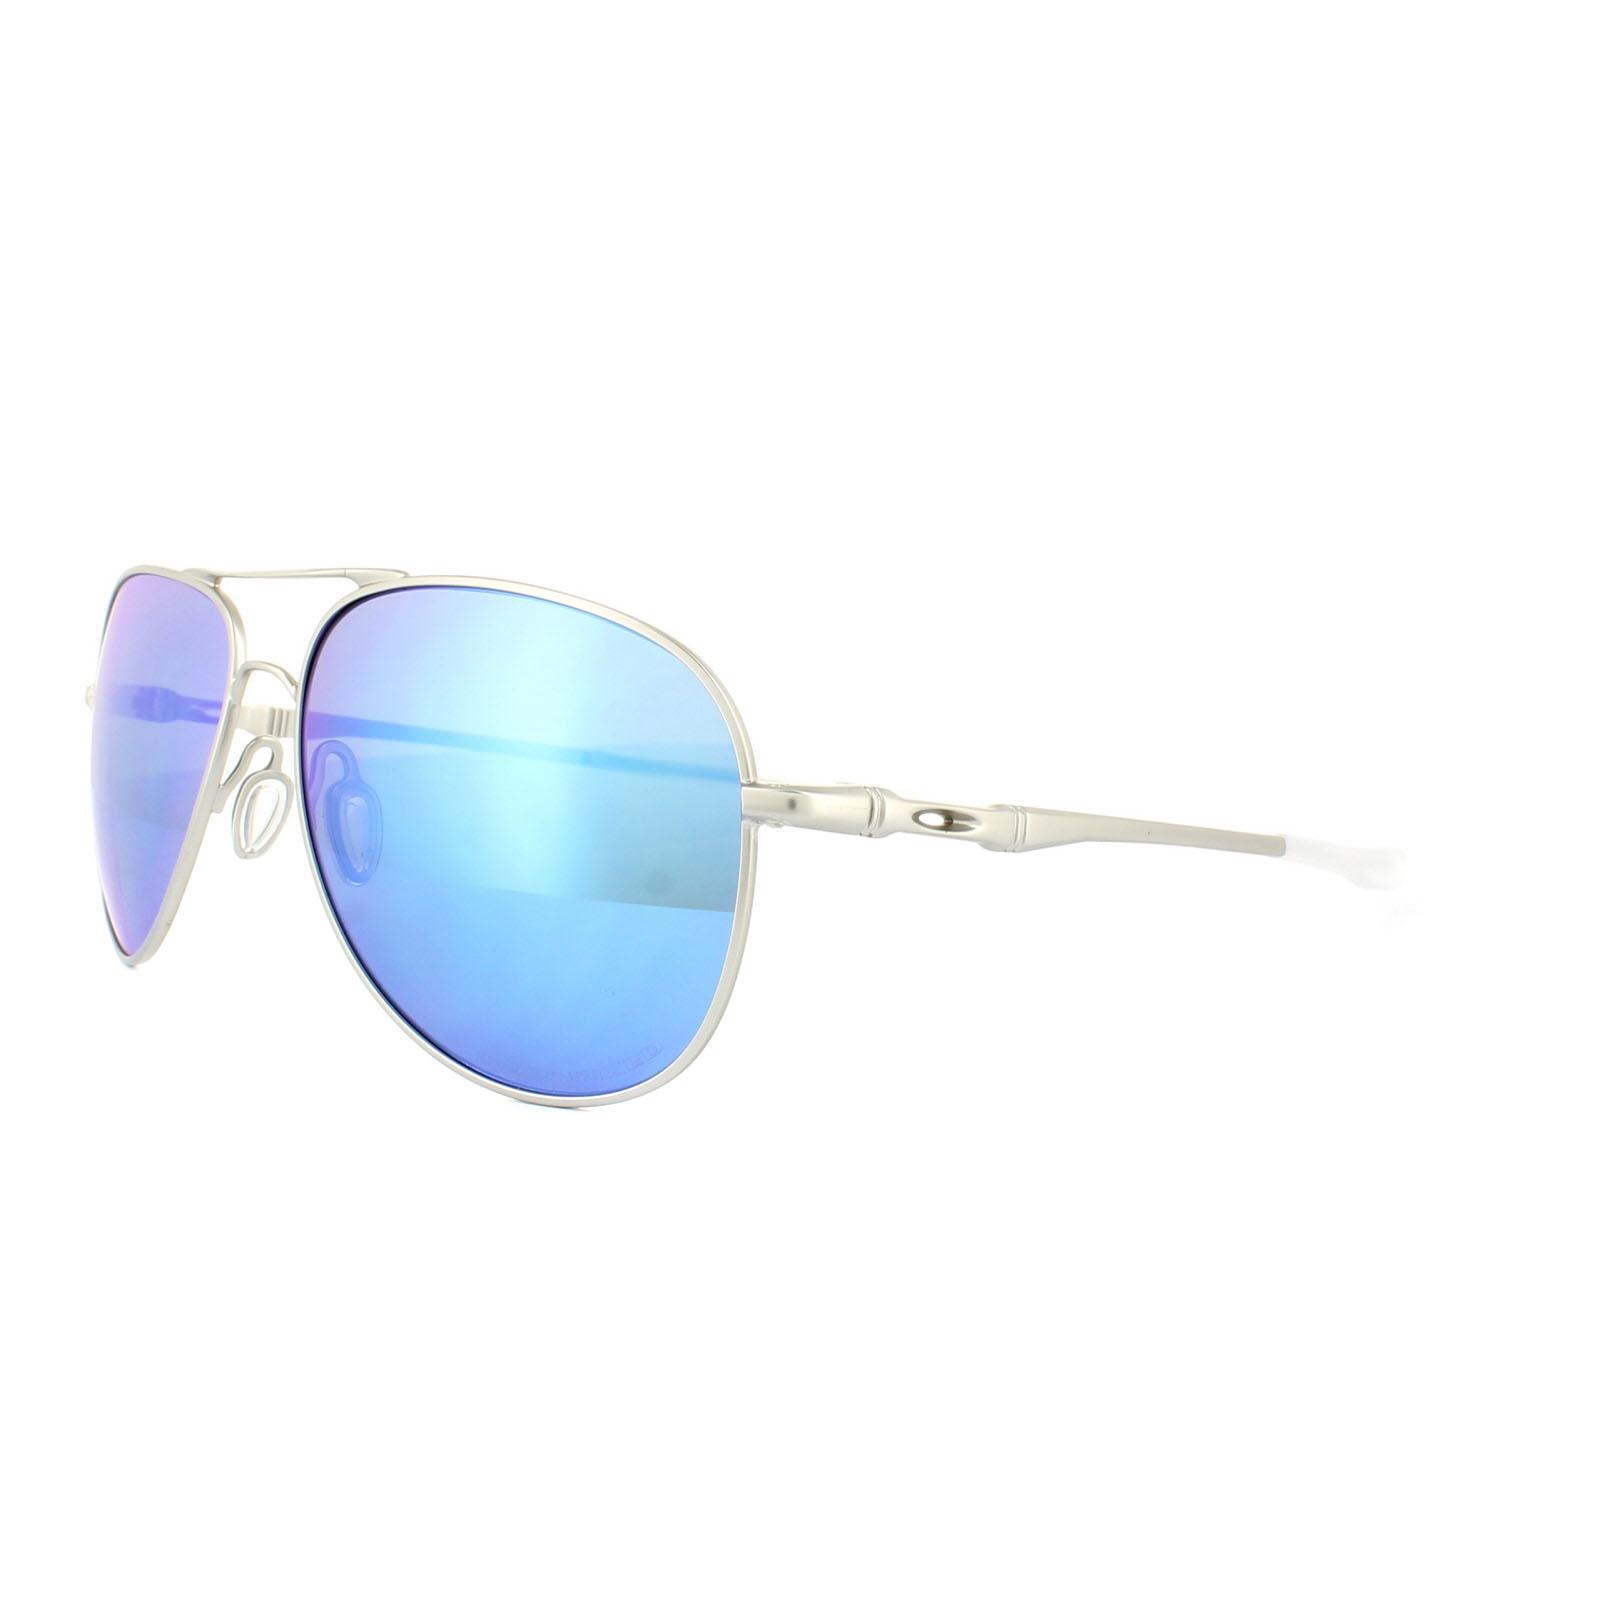 eea3b10b69 Sentinel Oakley Sunglasses Elmont M OO4119-07 Satin Chrome Sapphire Iridium  Polarized